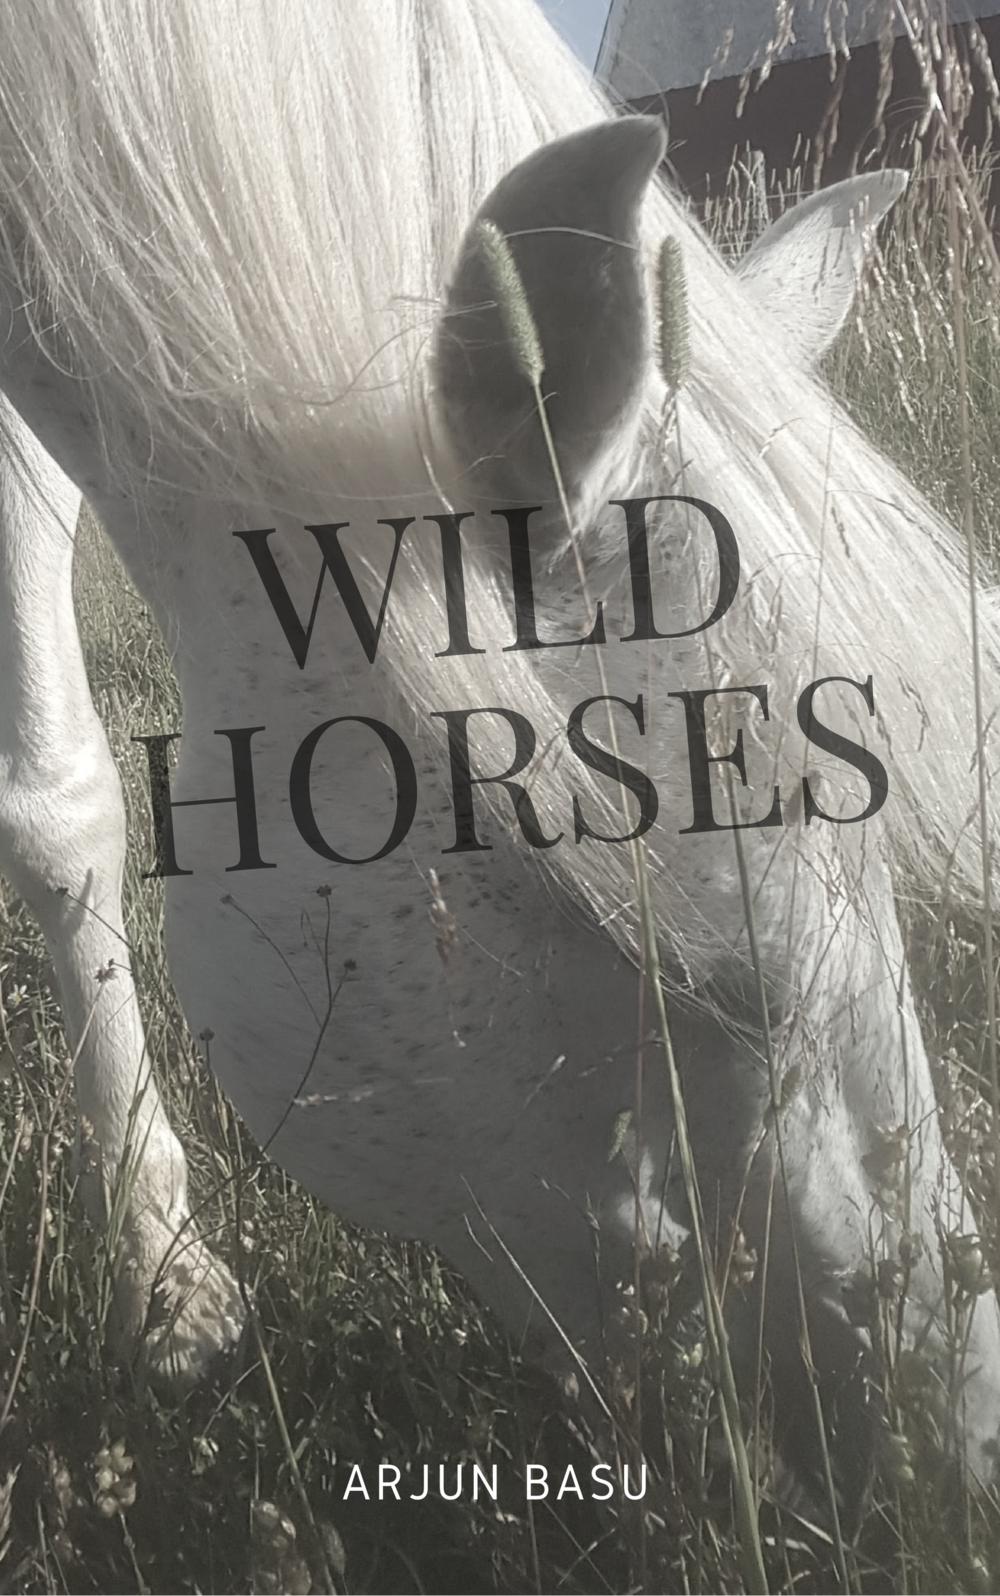 wildhorses.png